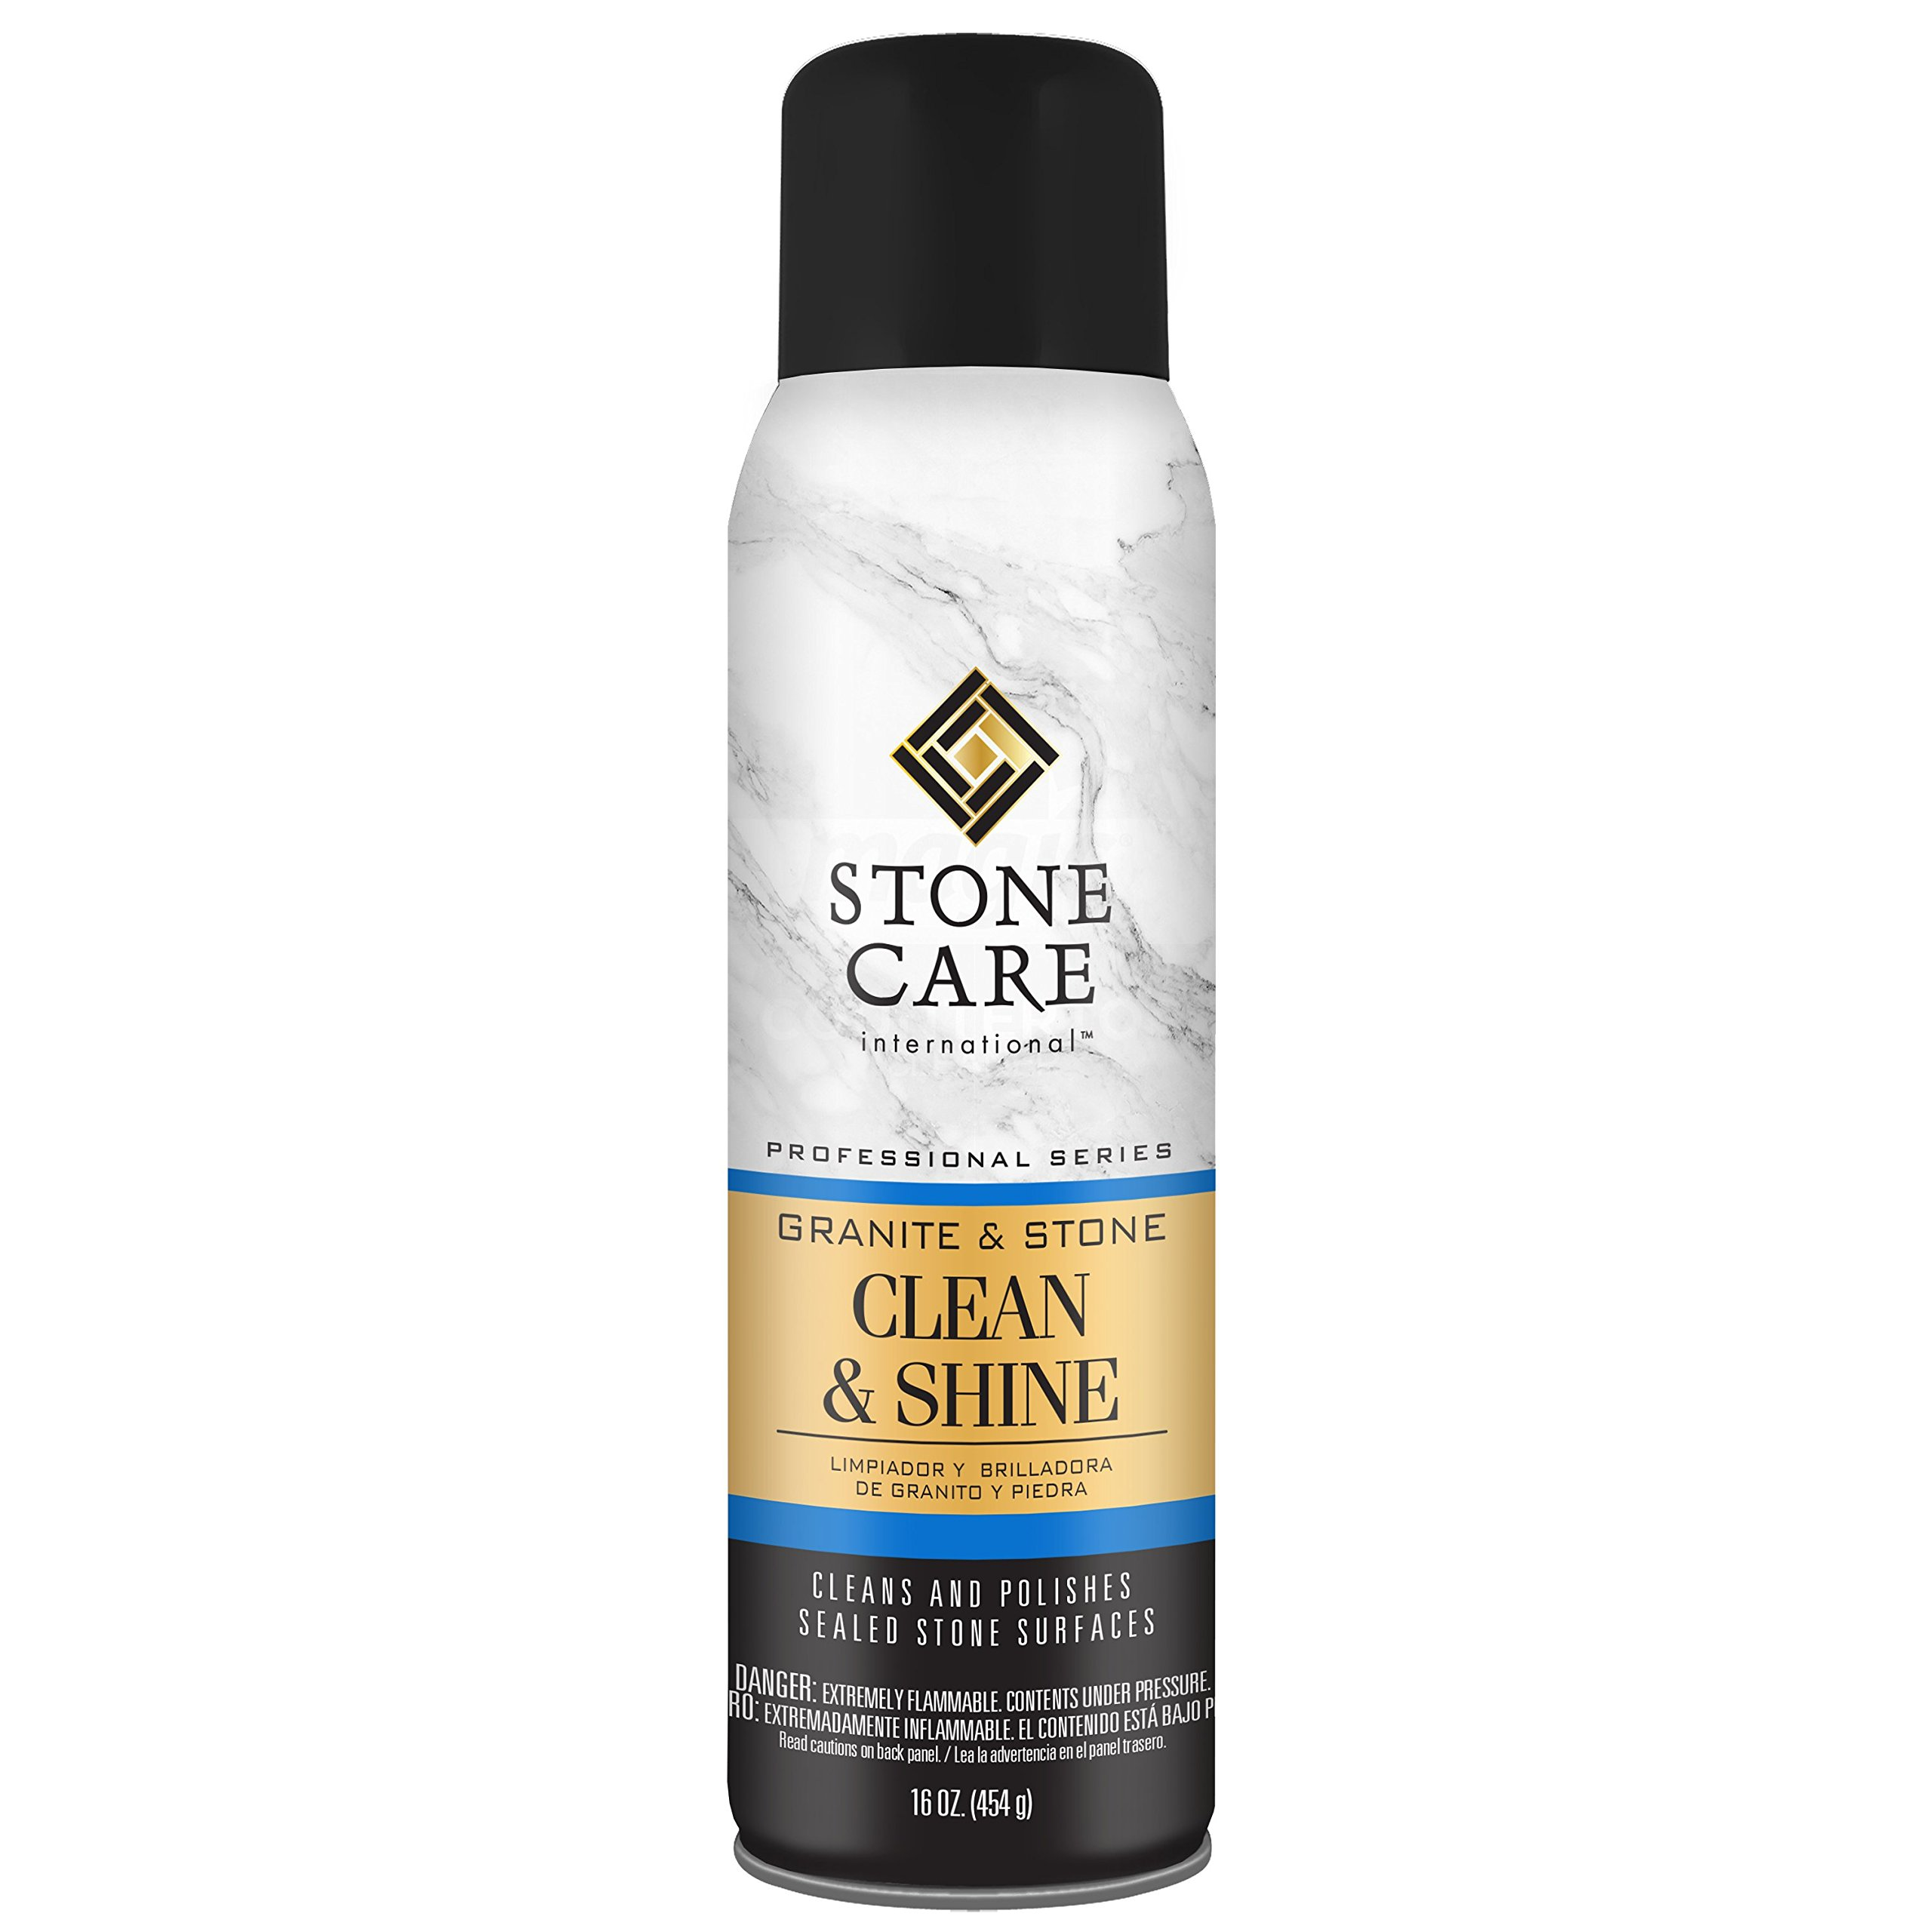 Stone Care International Granite and Stone Cleaner and Polish - 16 Ounce - Shine Aerosol for Granite Marble Soapstone Quartz Quartzite Slate Limestone Corian Laminate Tile Countertop